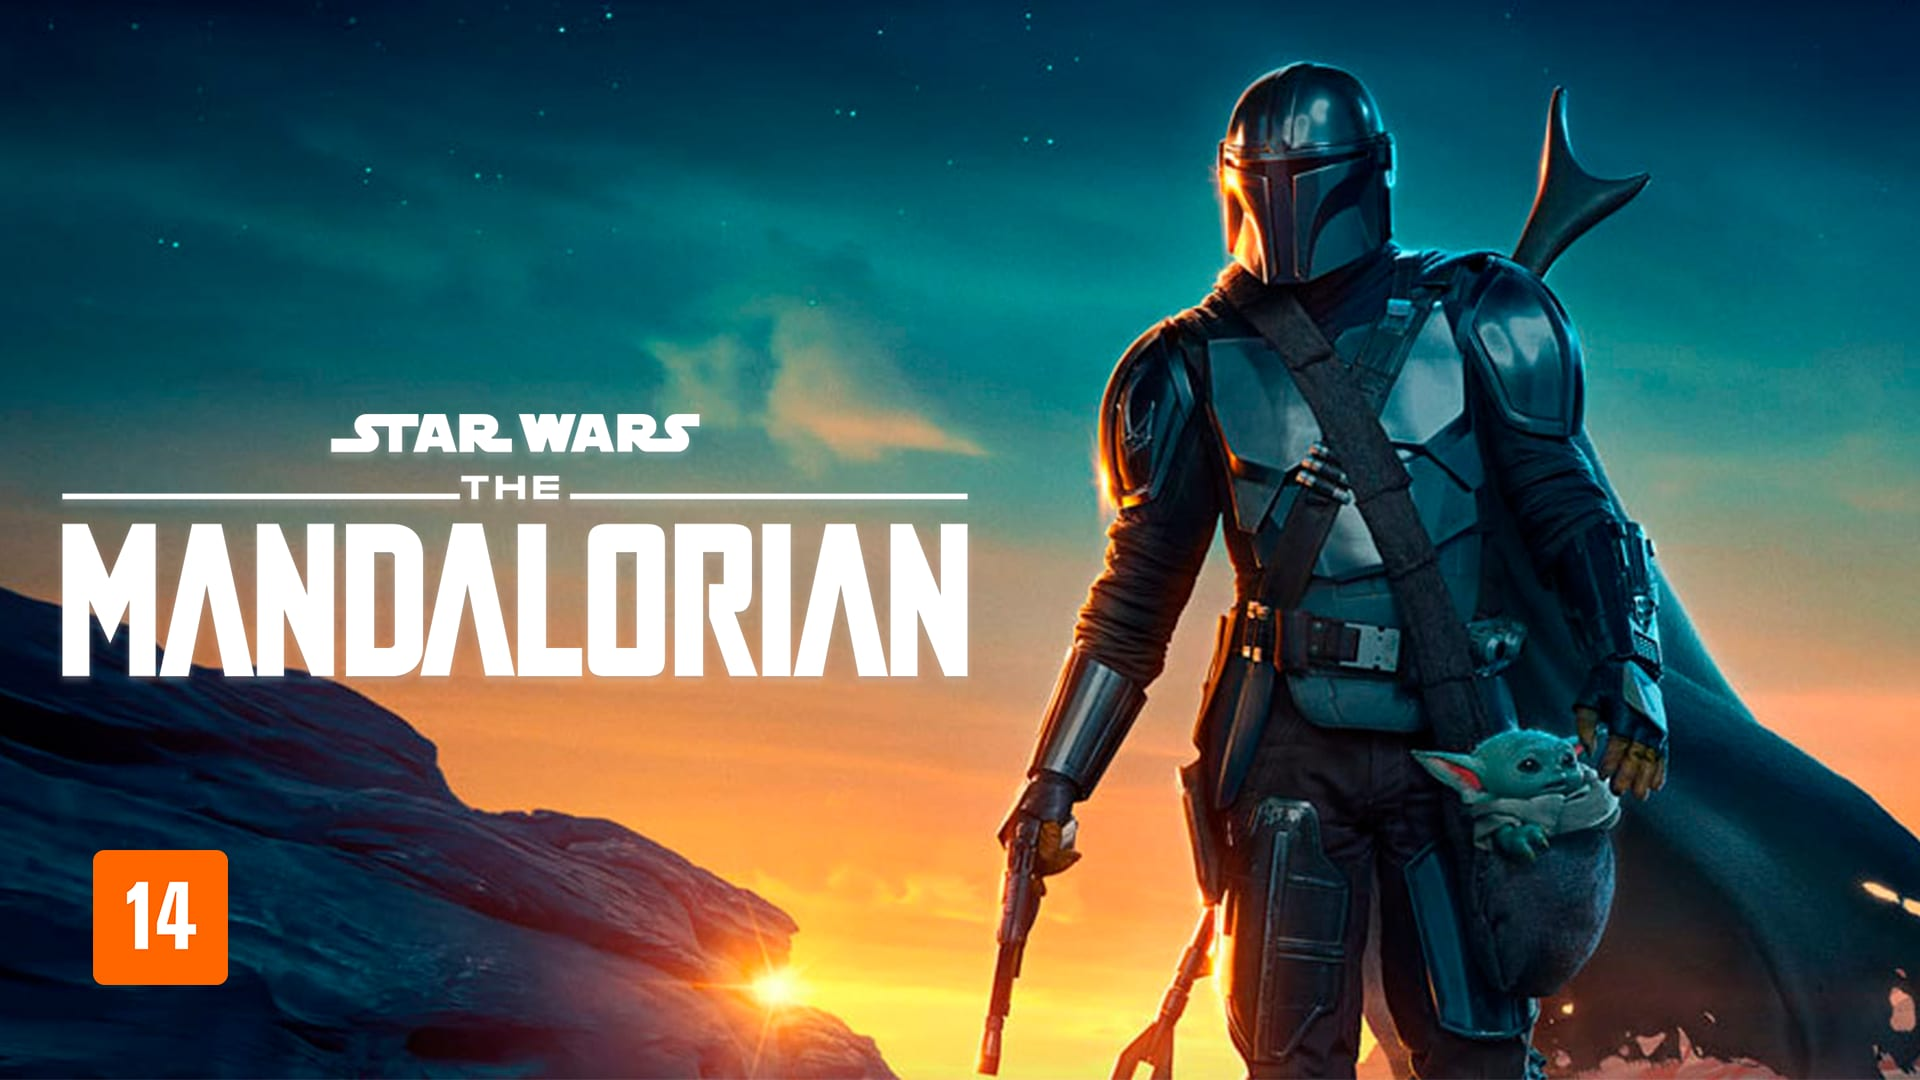 The Mandalorian | Disponível no Disney+ a partir de 17 de novembro